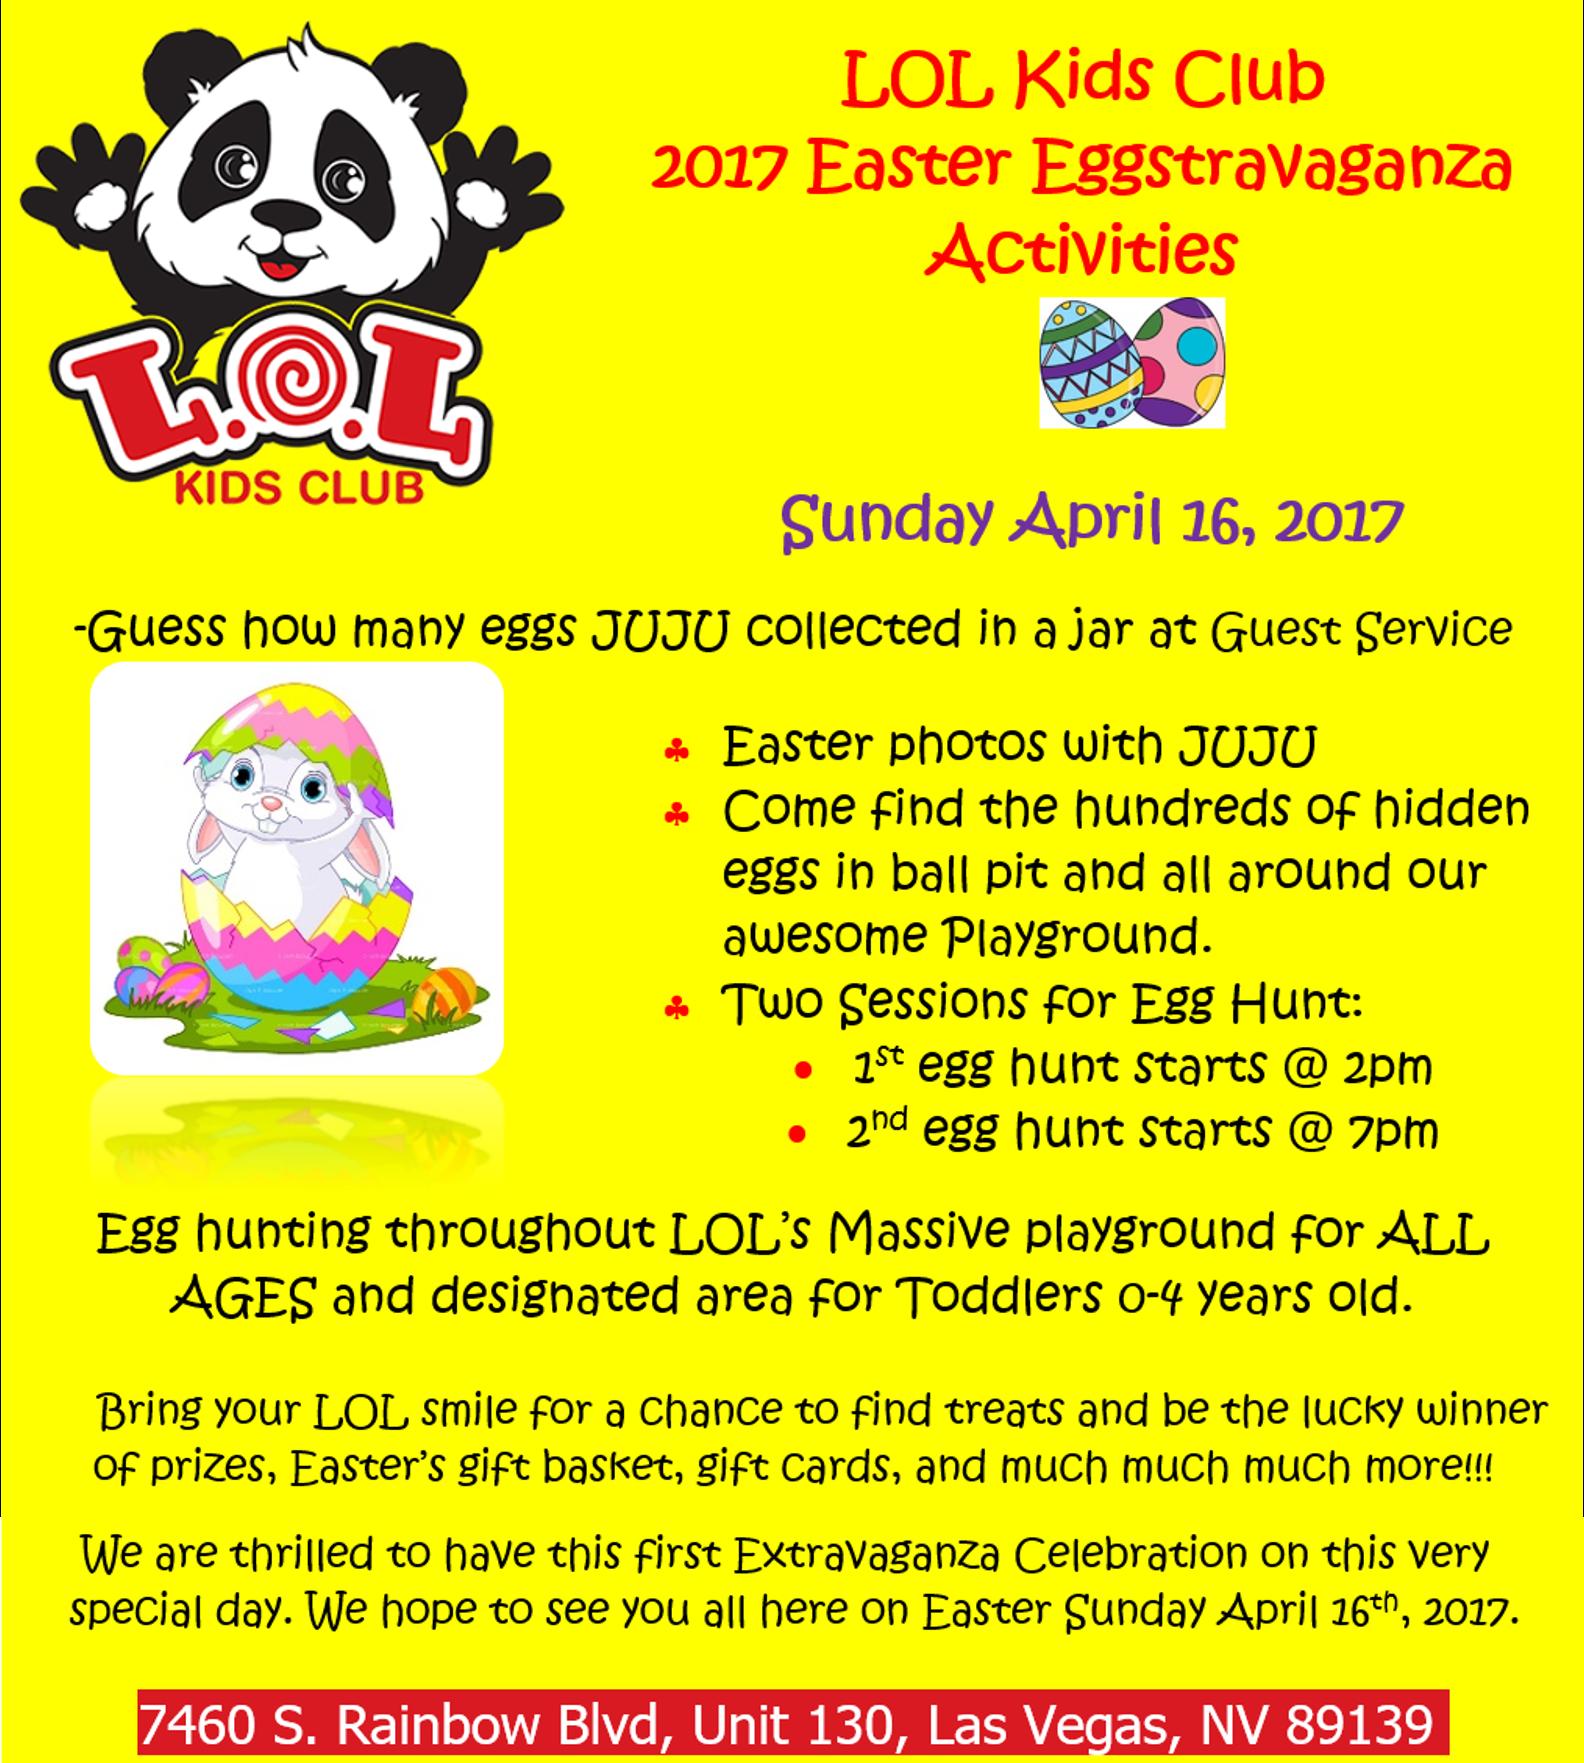 Lol kids club easter eggstravaganza lol kids club home lol kids club easter eggstravaganza negle Gallery